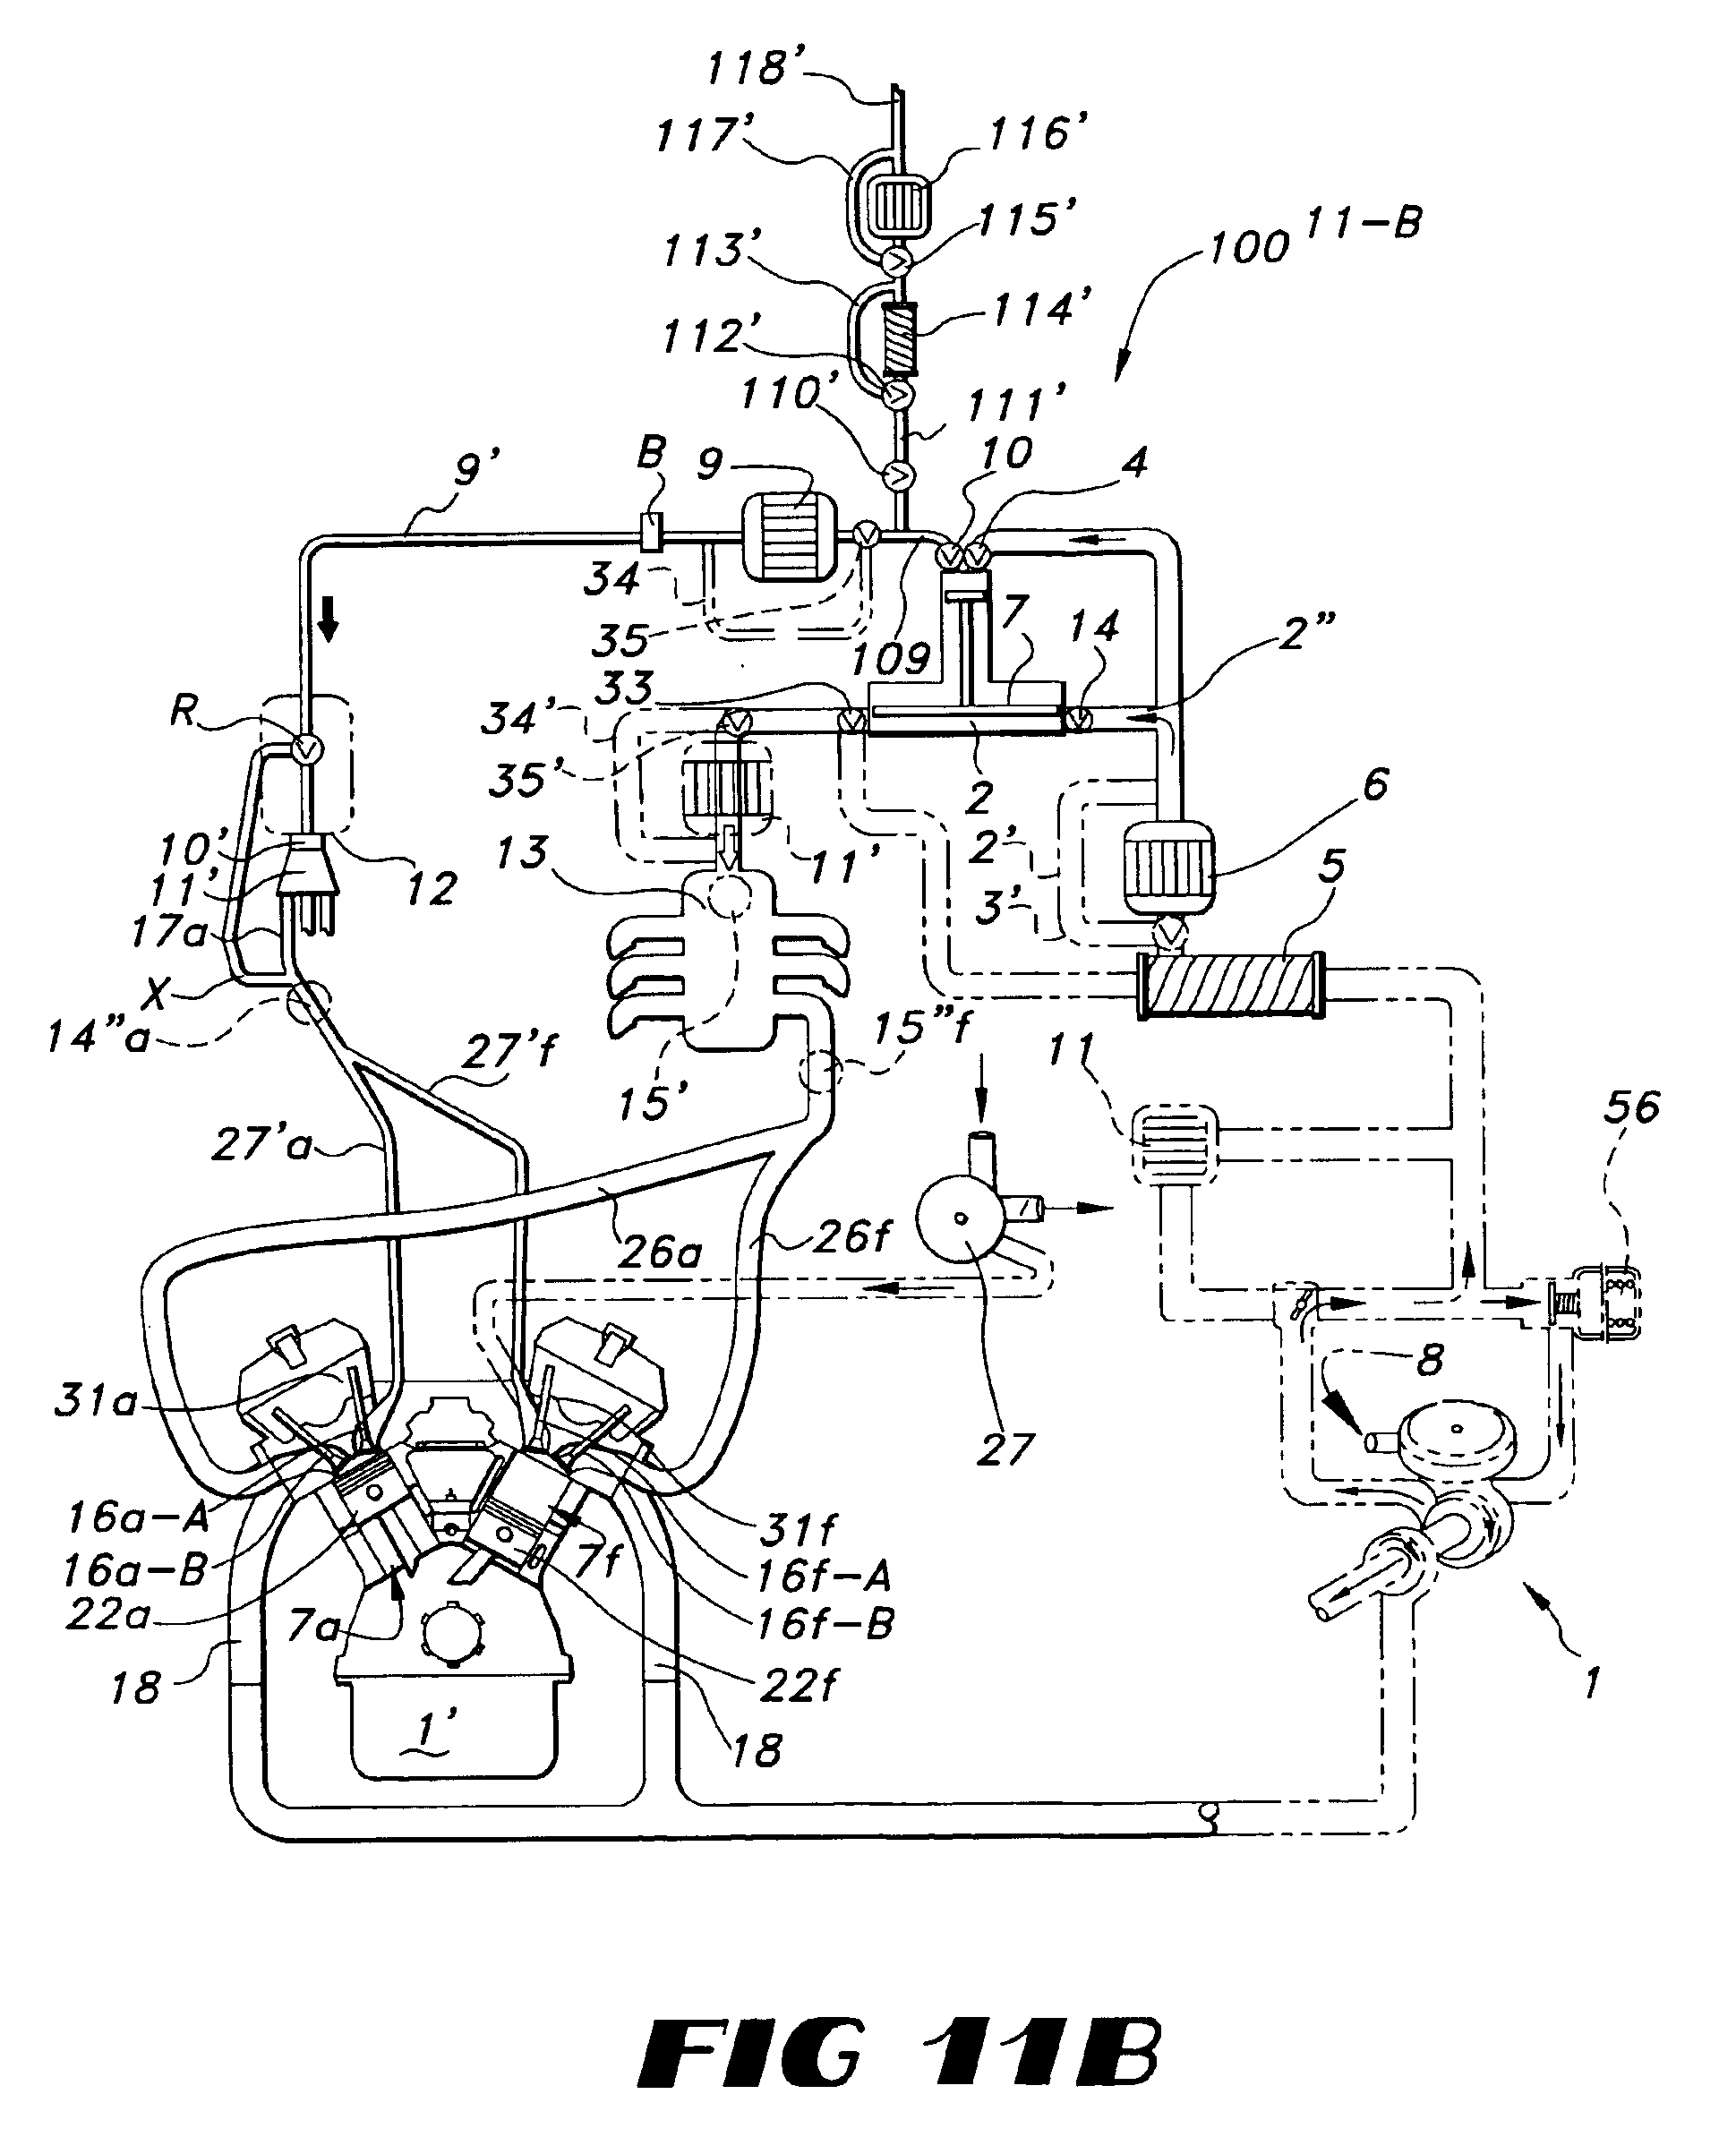 john deere pto clutch wiring harness gy21127 wiring